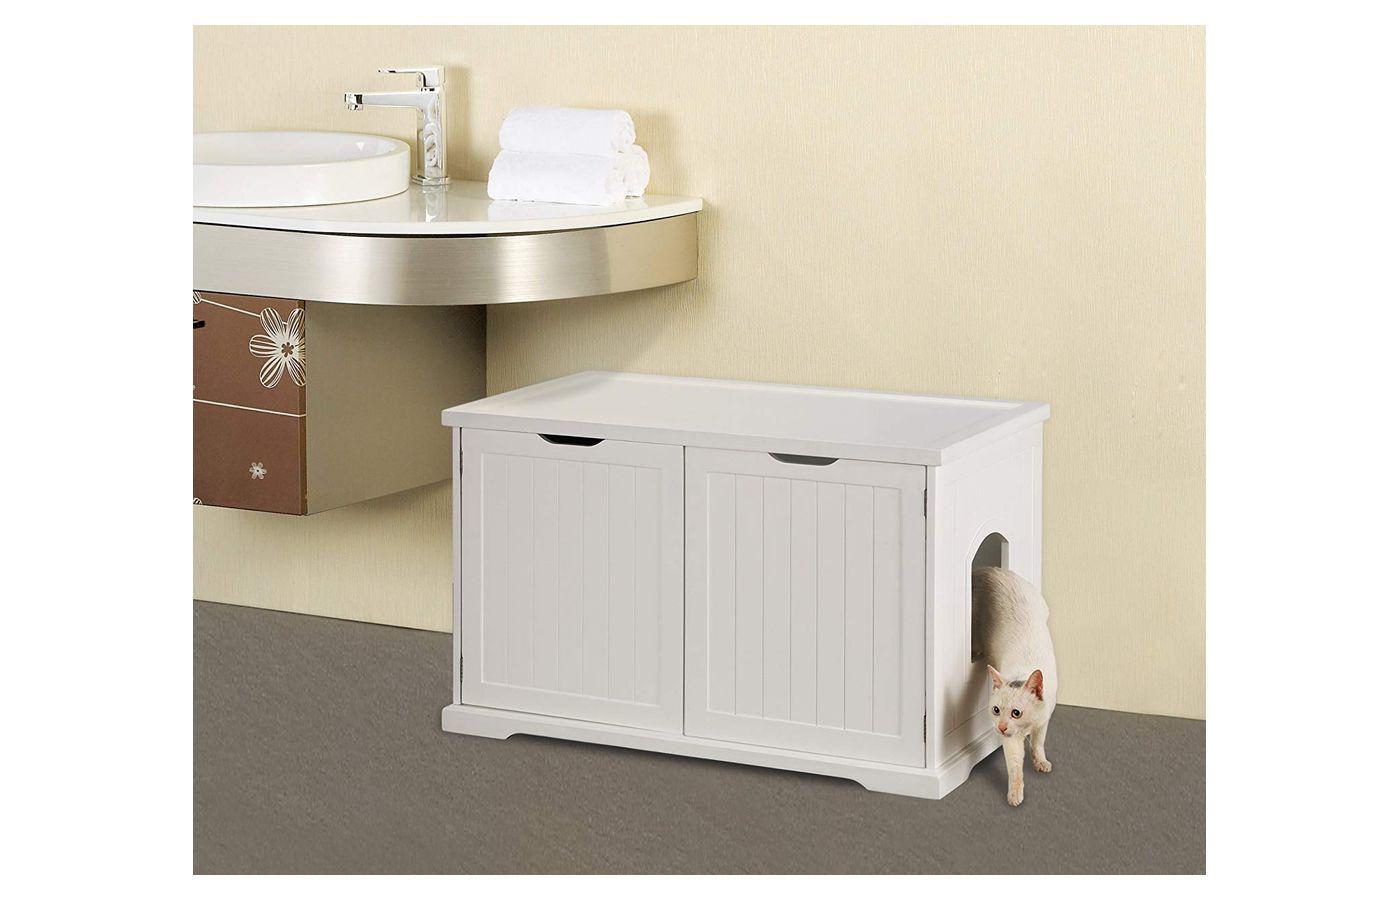 Merry Pet Washroom Bench Litter Box Enclosure